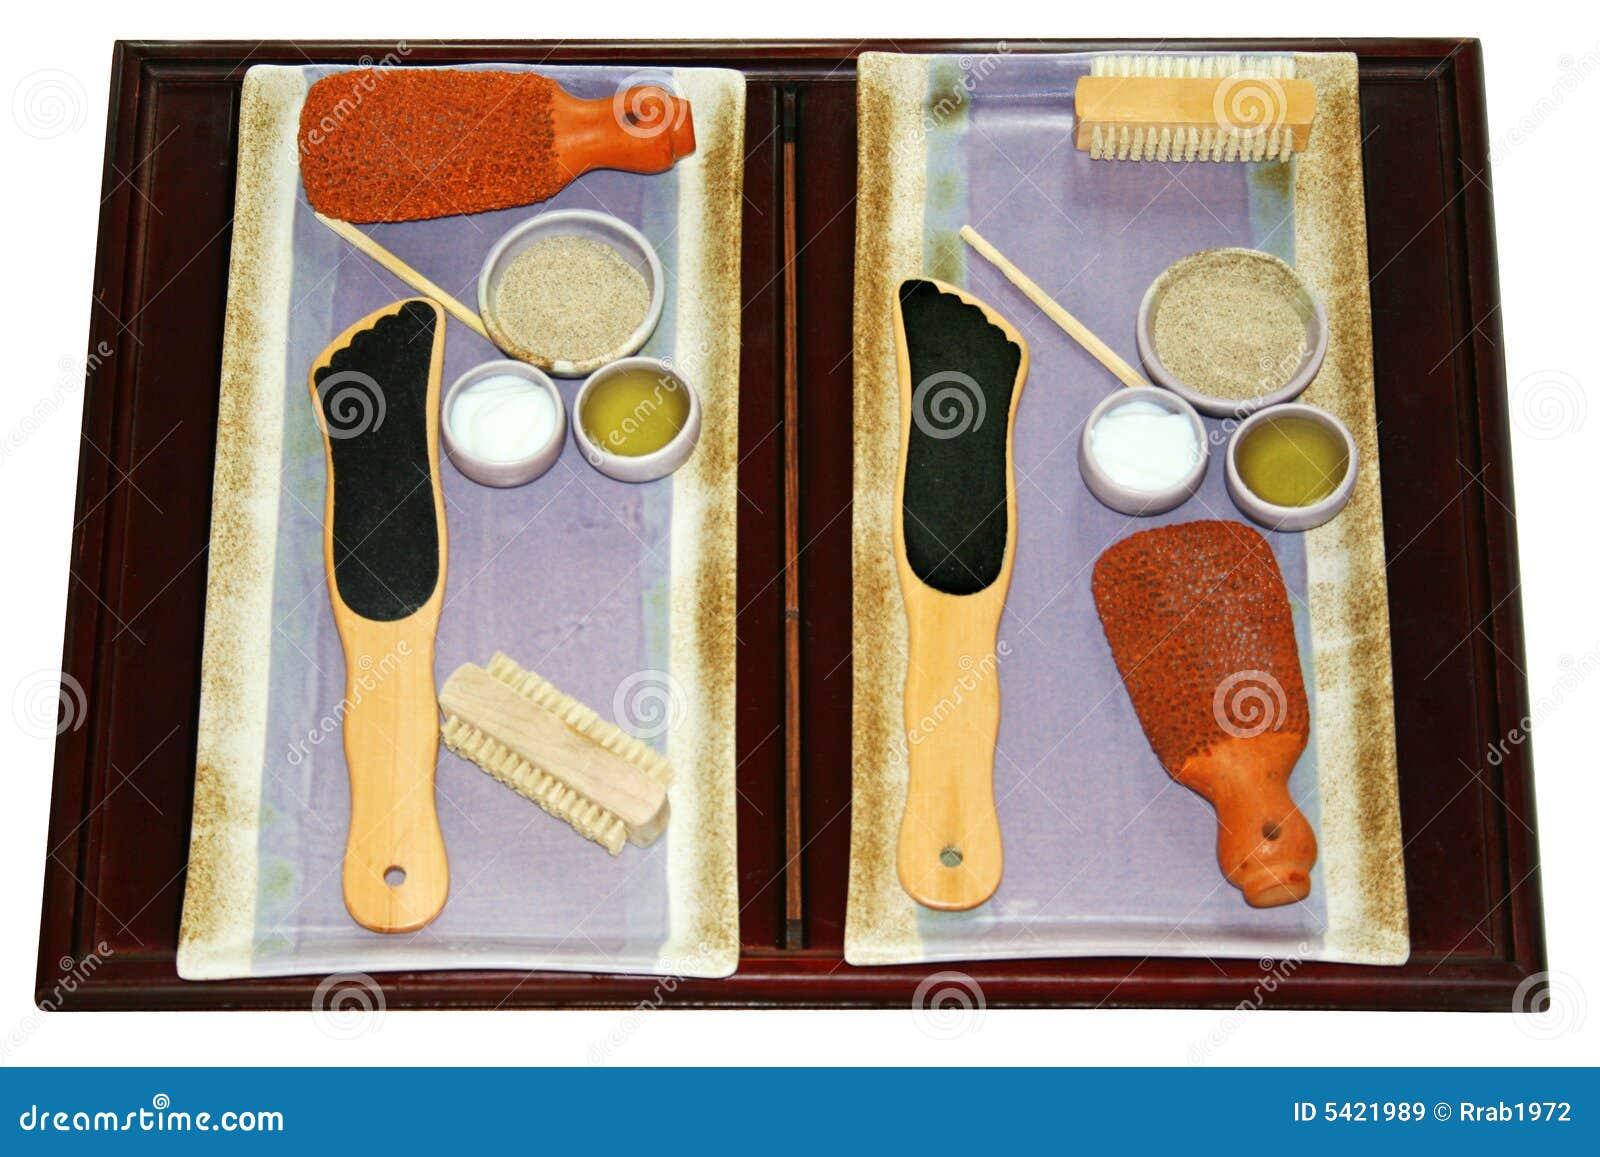 Foot Scrub Spa Materials Royalty Free Stock Images Image 5421989